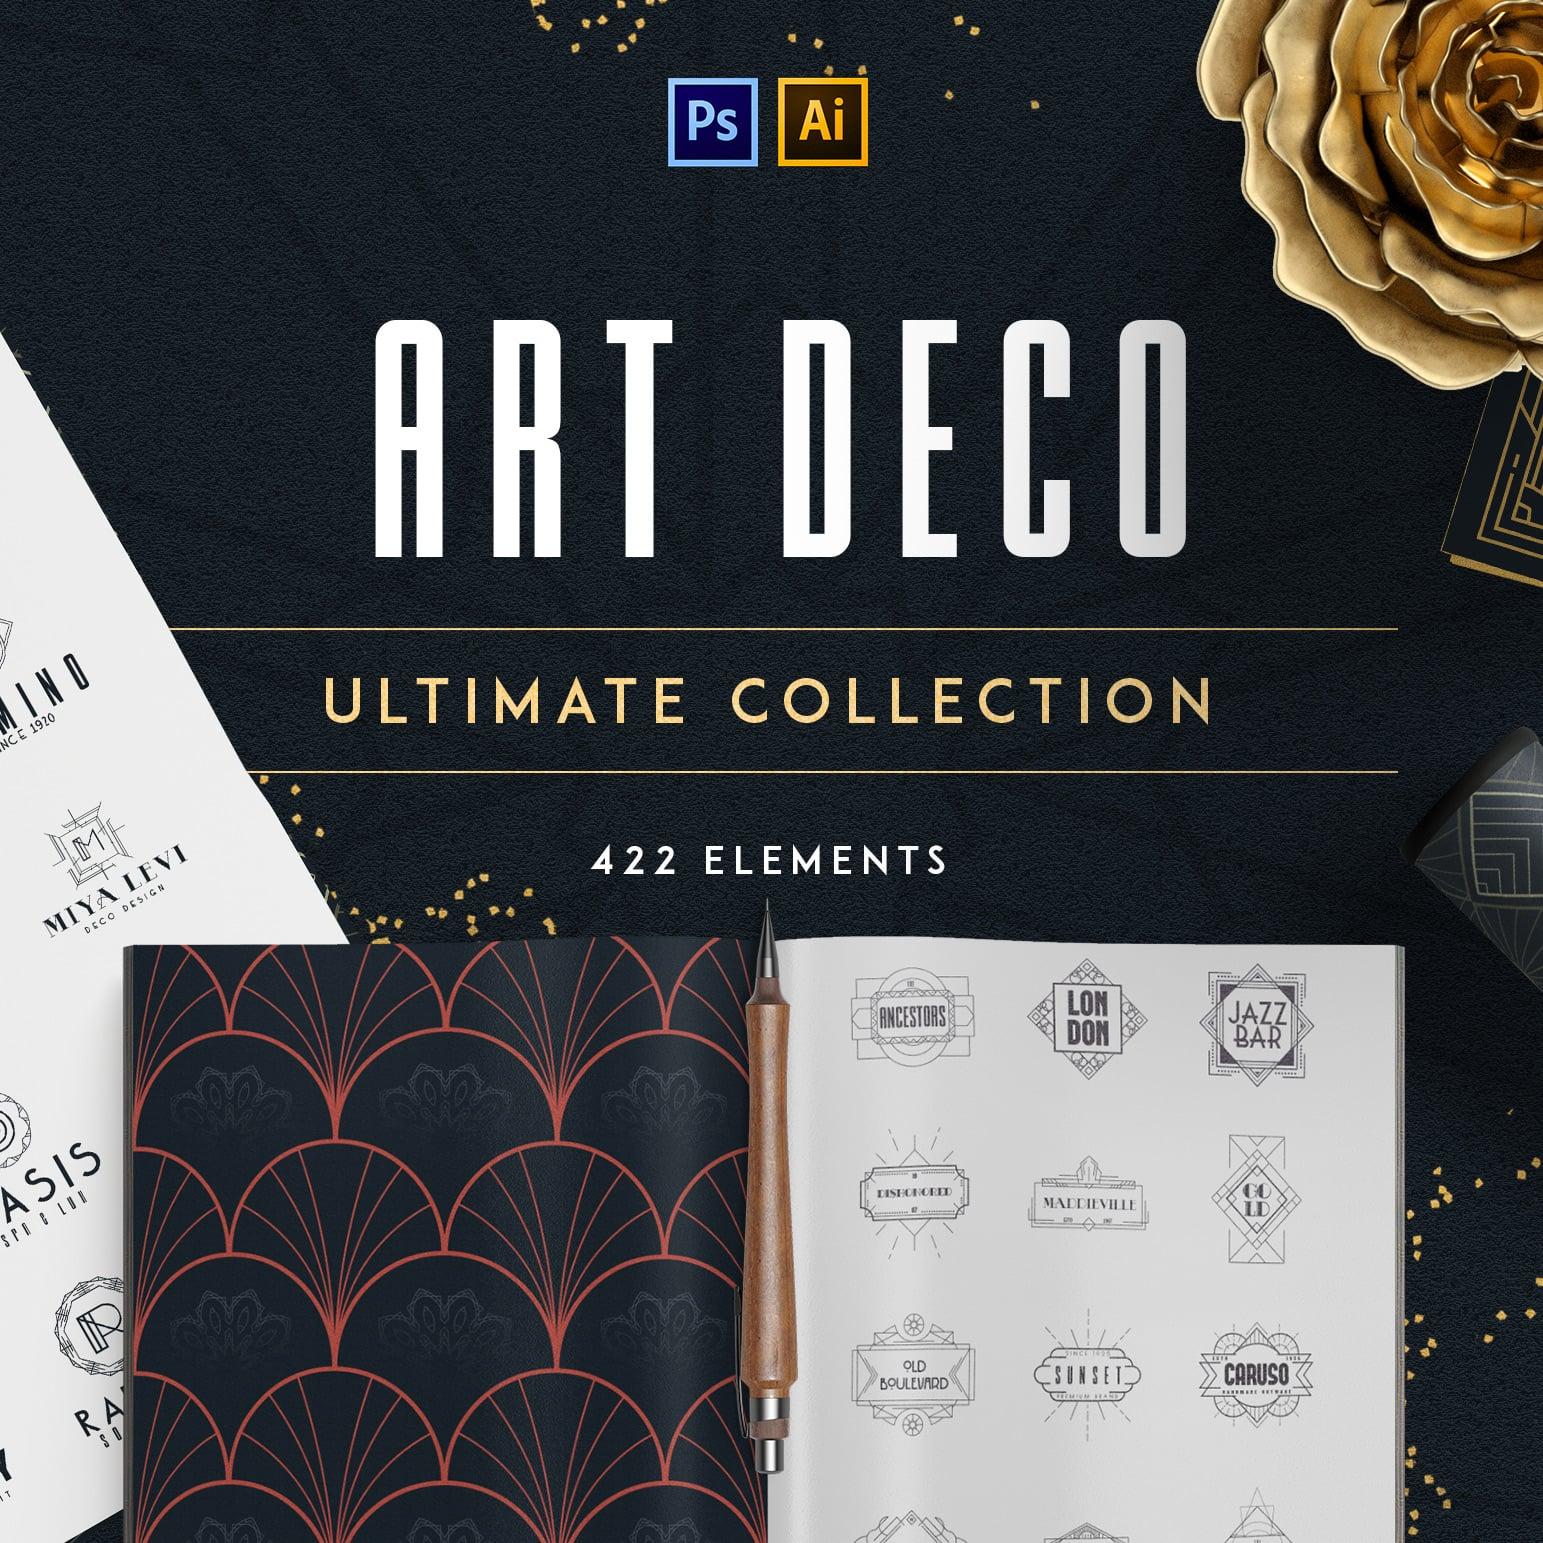 12 Art Deco illustrations - Ai, EPS, PSD - 490 1